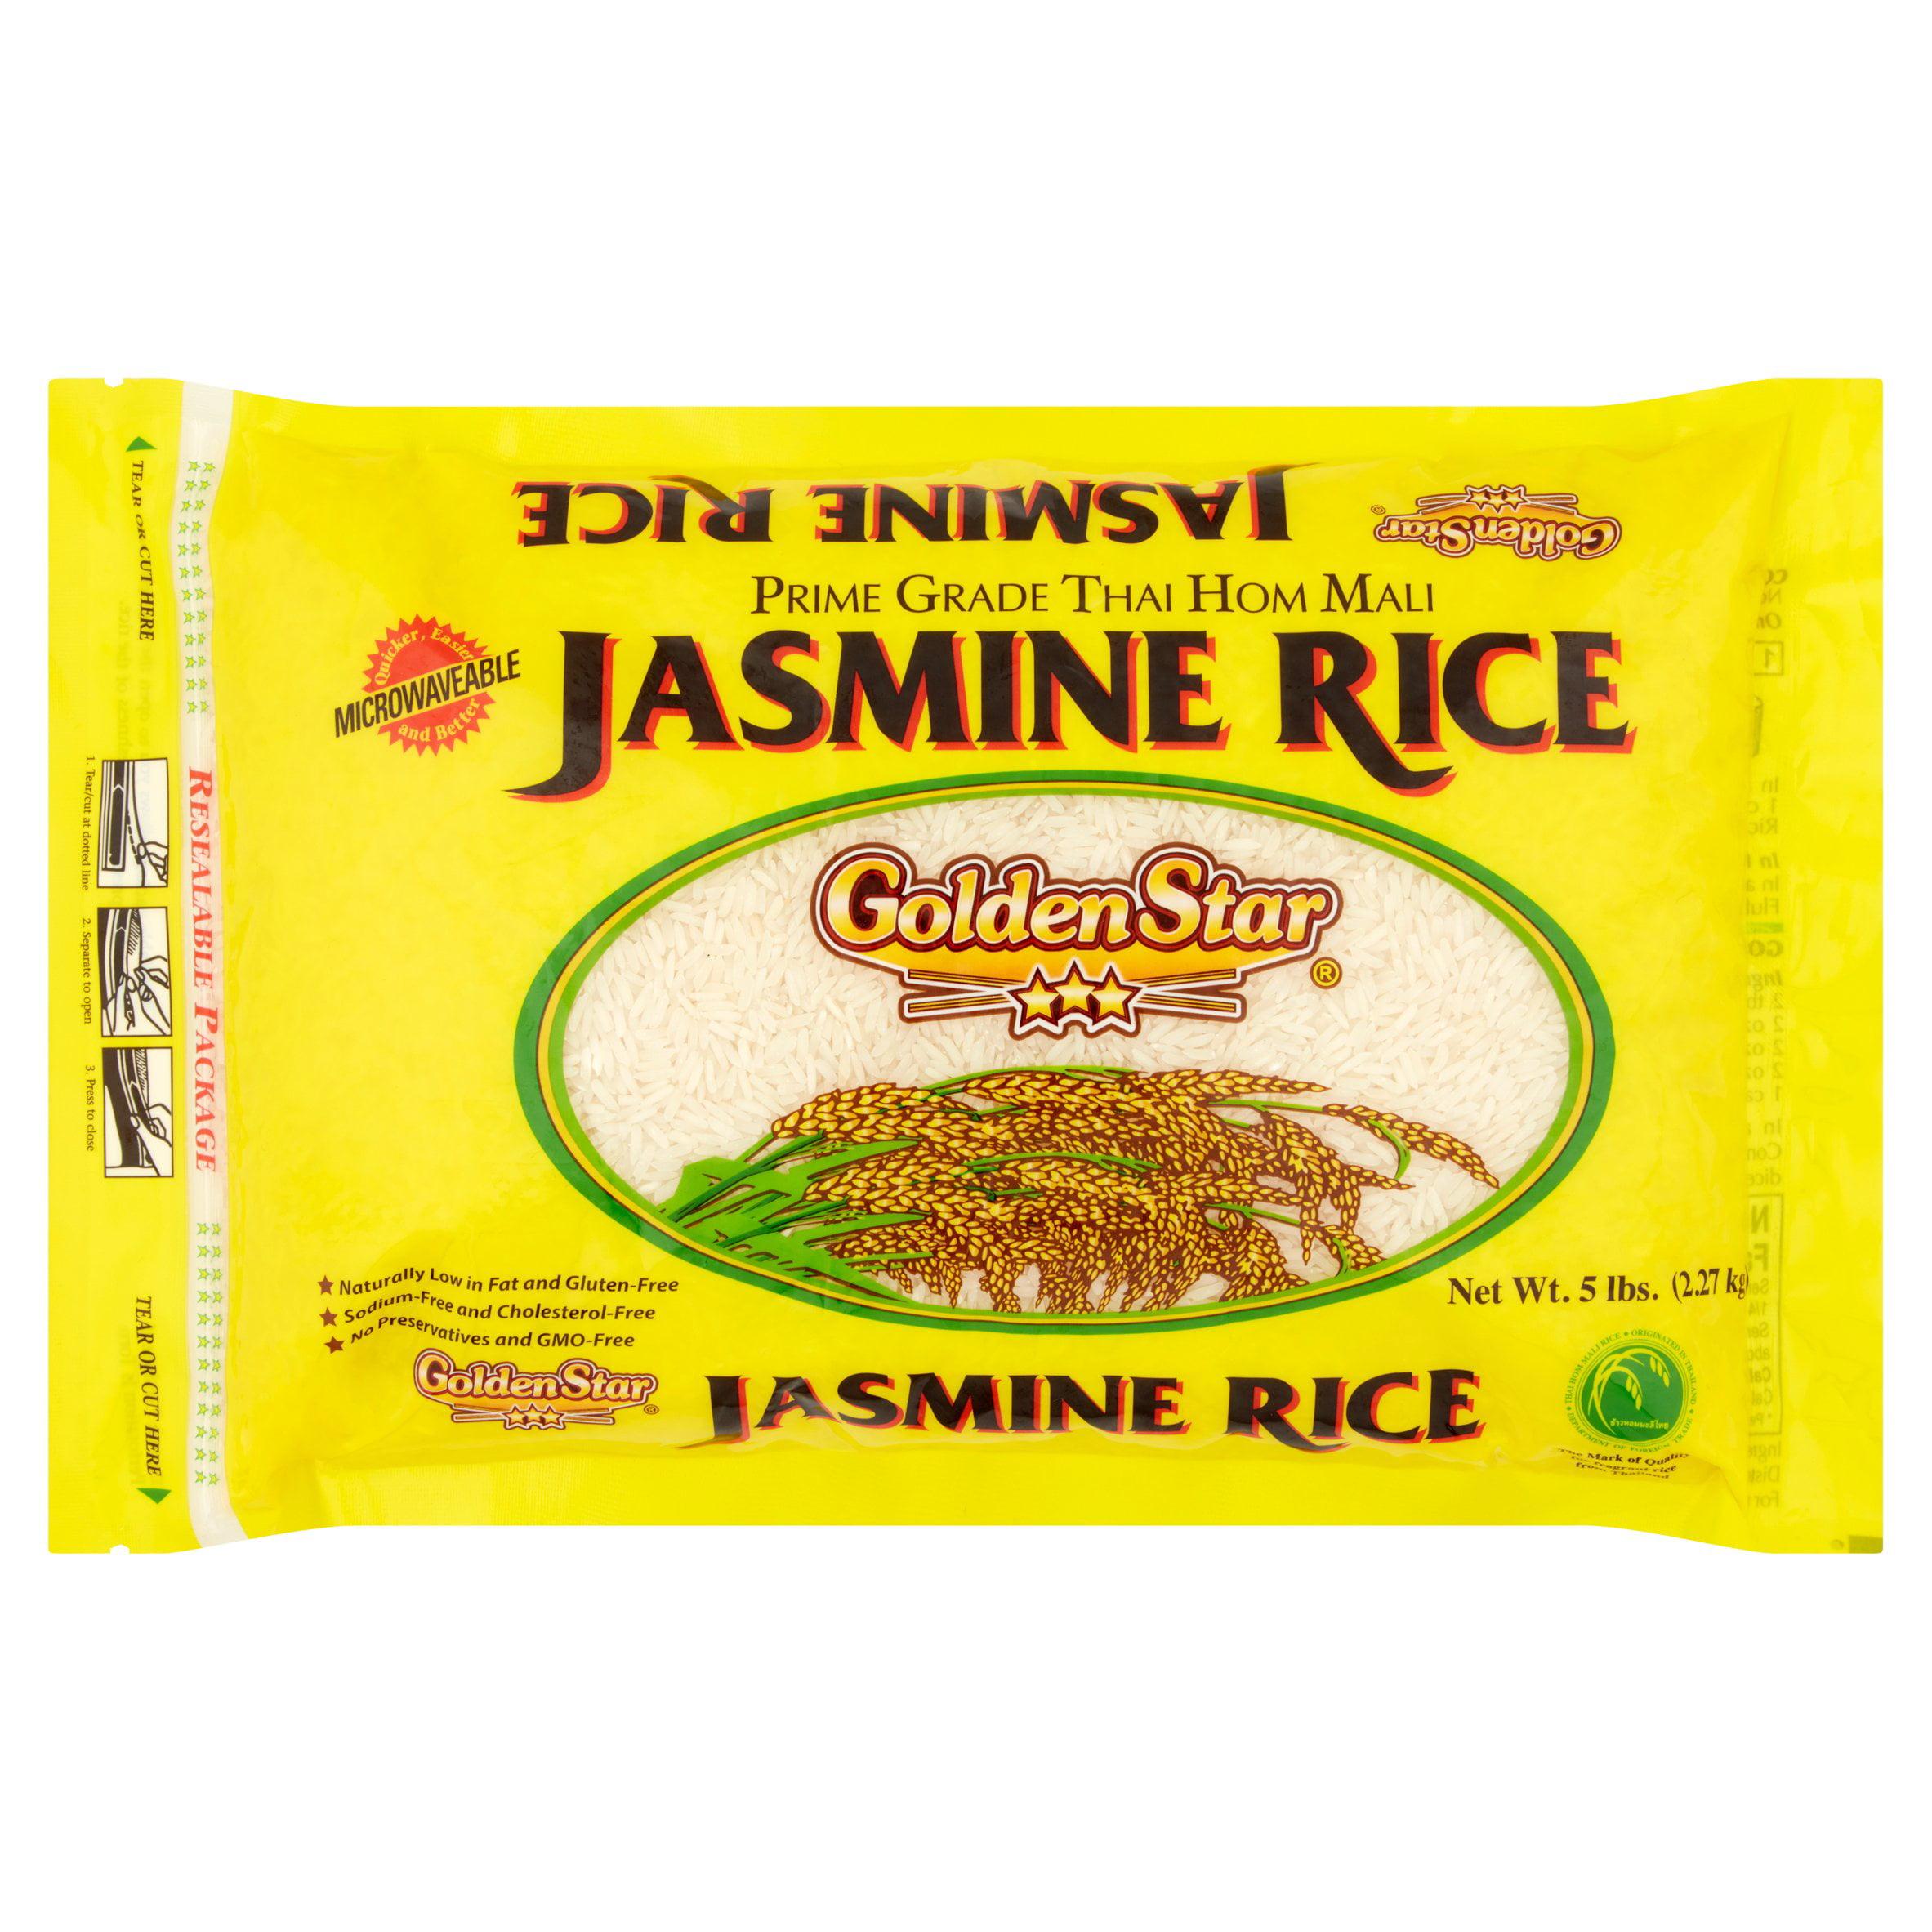 Golden Star Prime Grade Long Grain Fragrant Jasmine Rice, 5 lb